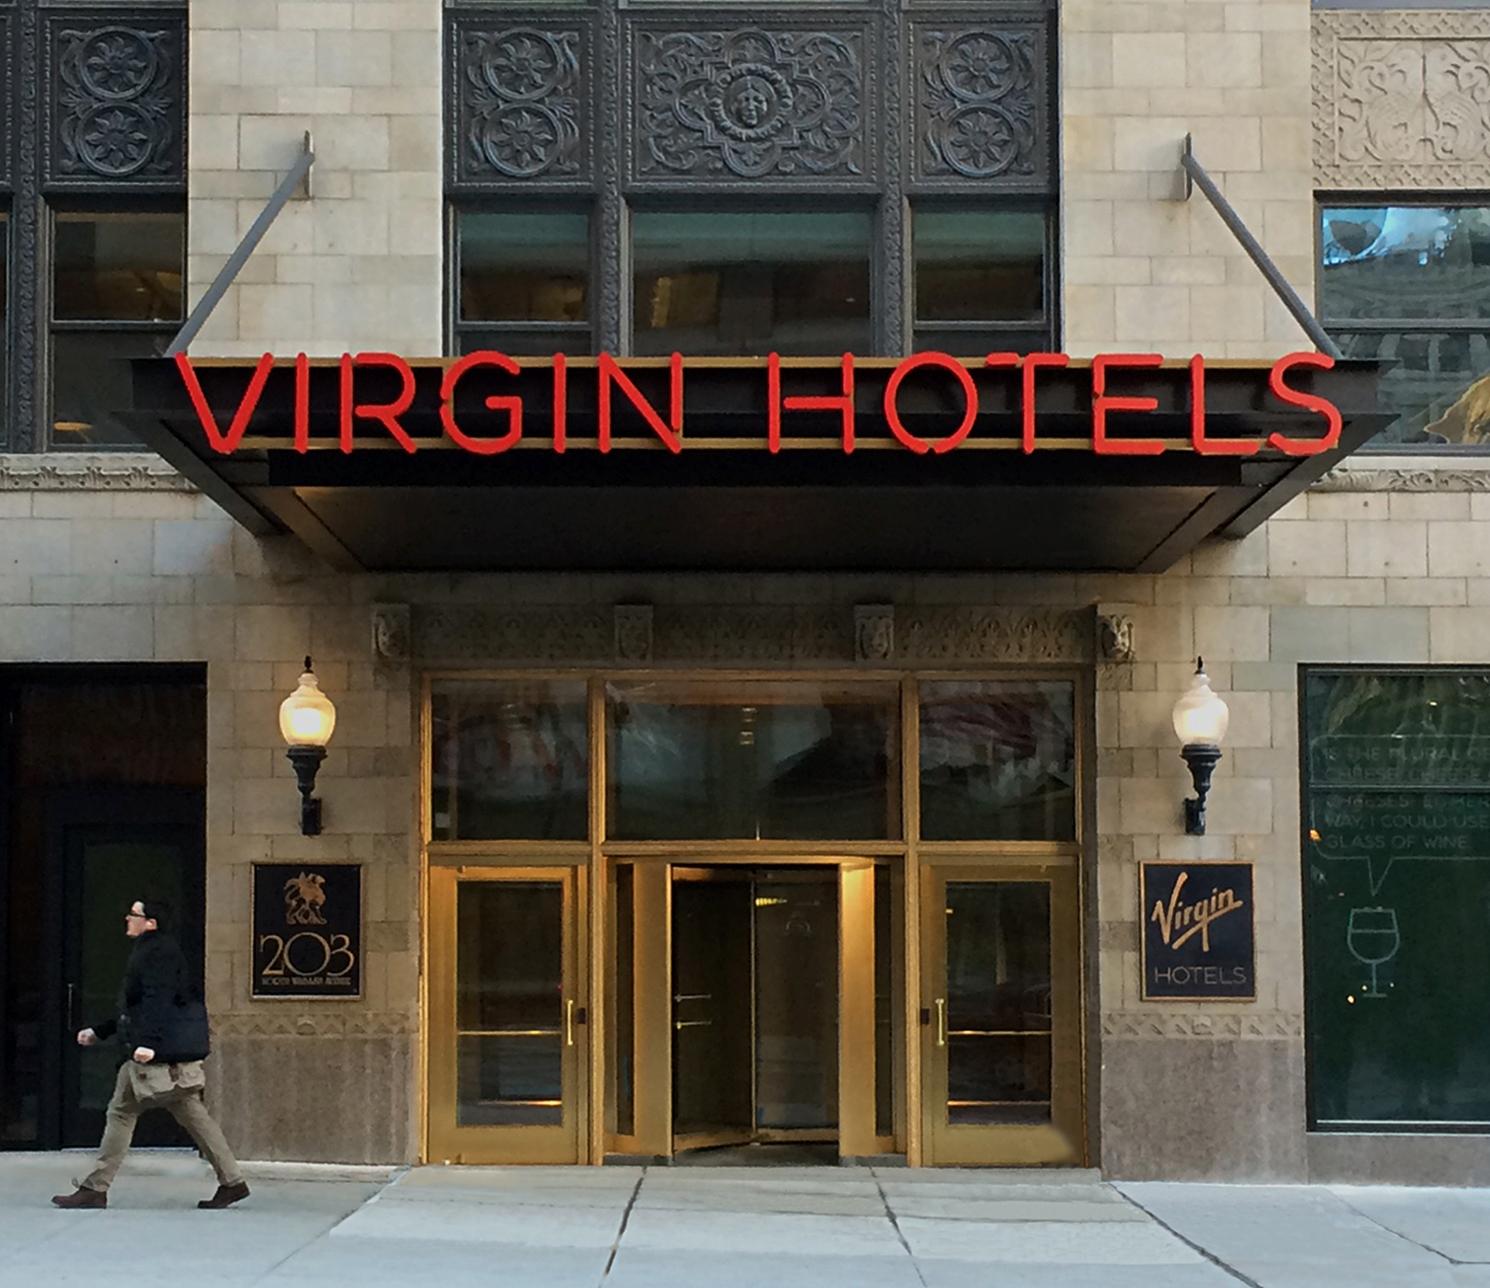 Virgin Hotels Chicago exterior